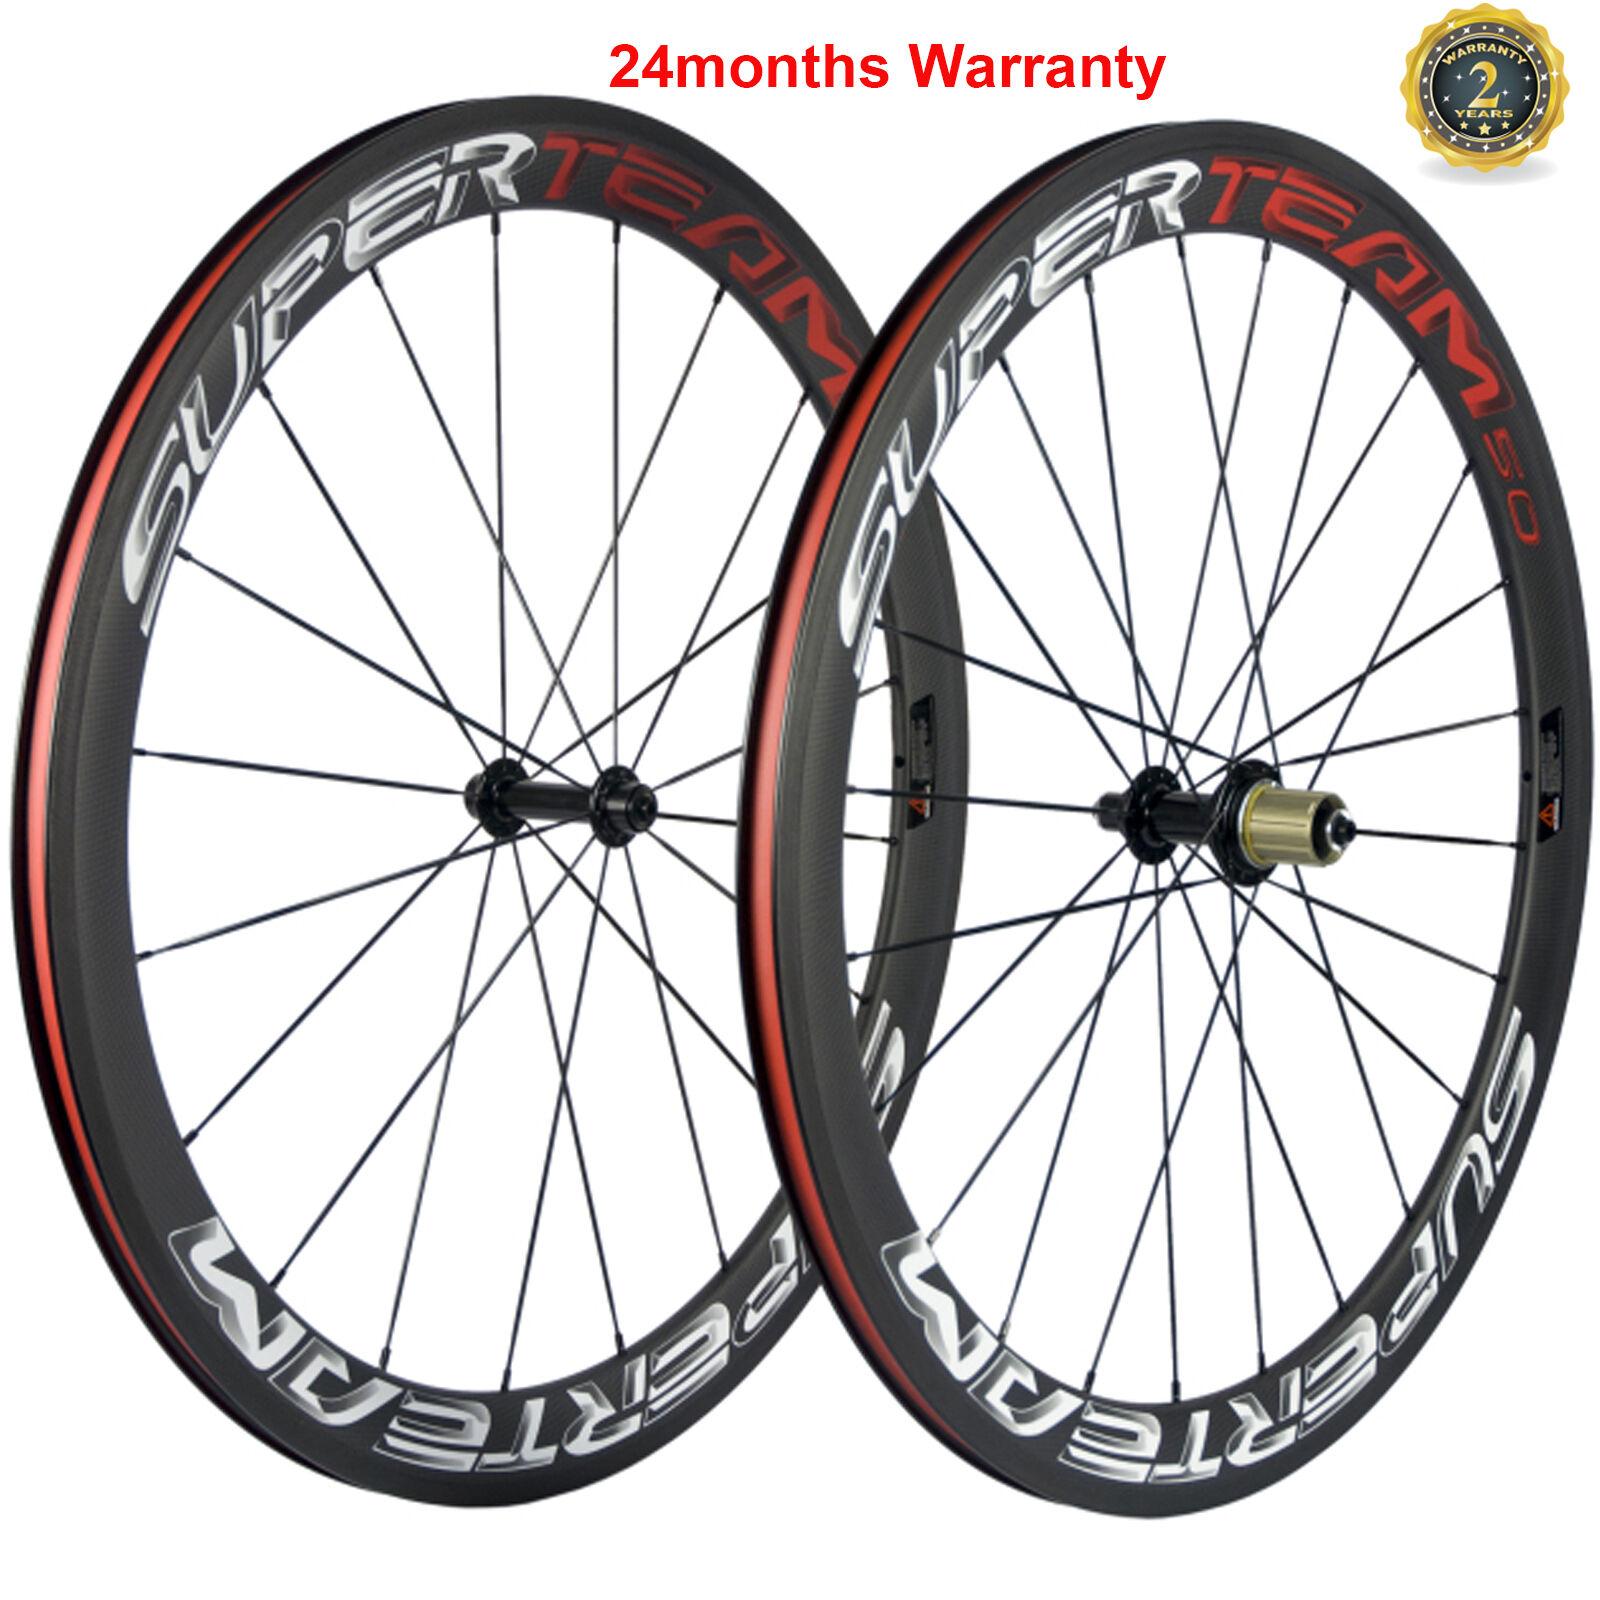 50mm Clincher Carbon Wheels Bicycle Carbon Wheelset 700C Shimano 3k Matte Finish